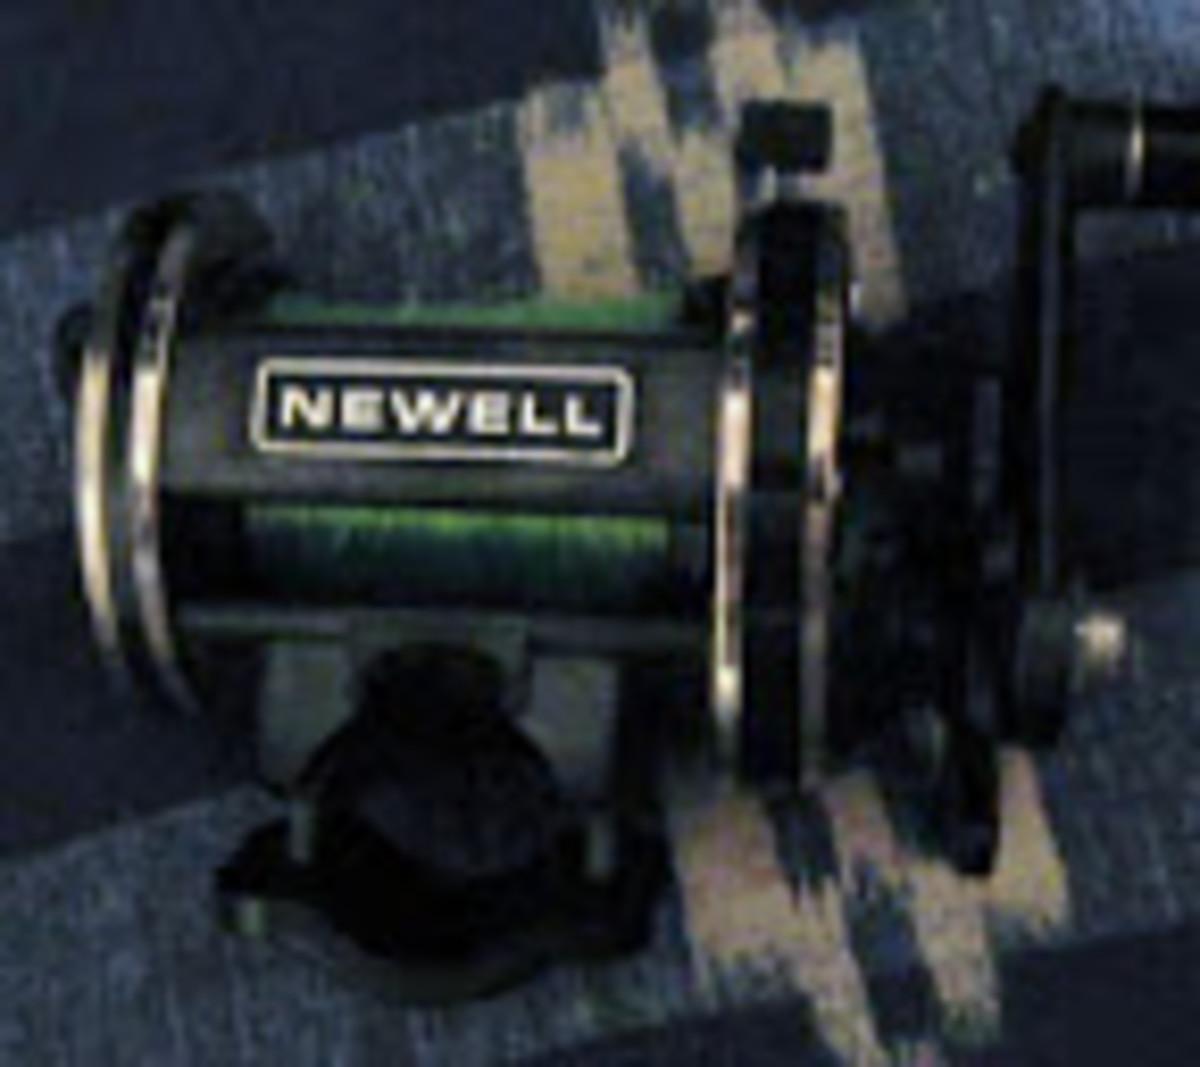 Newell 209M